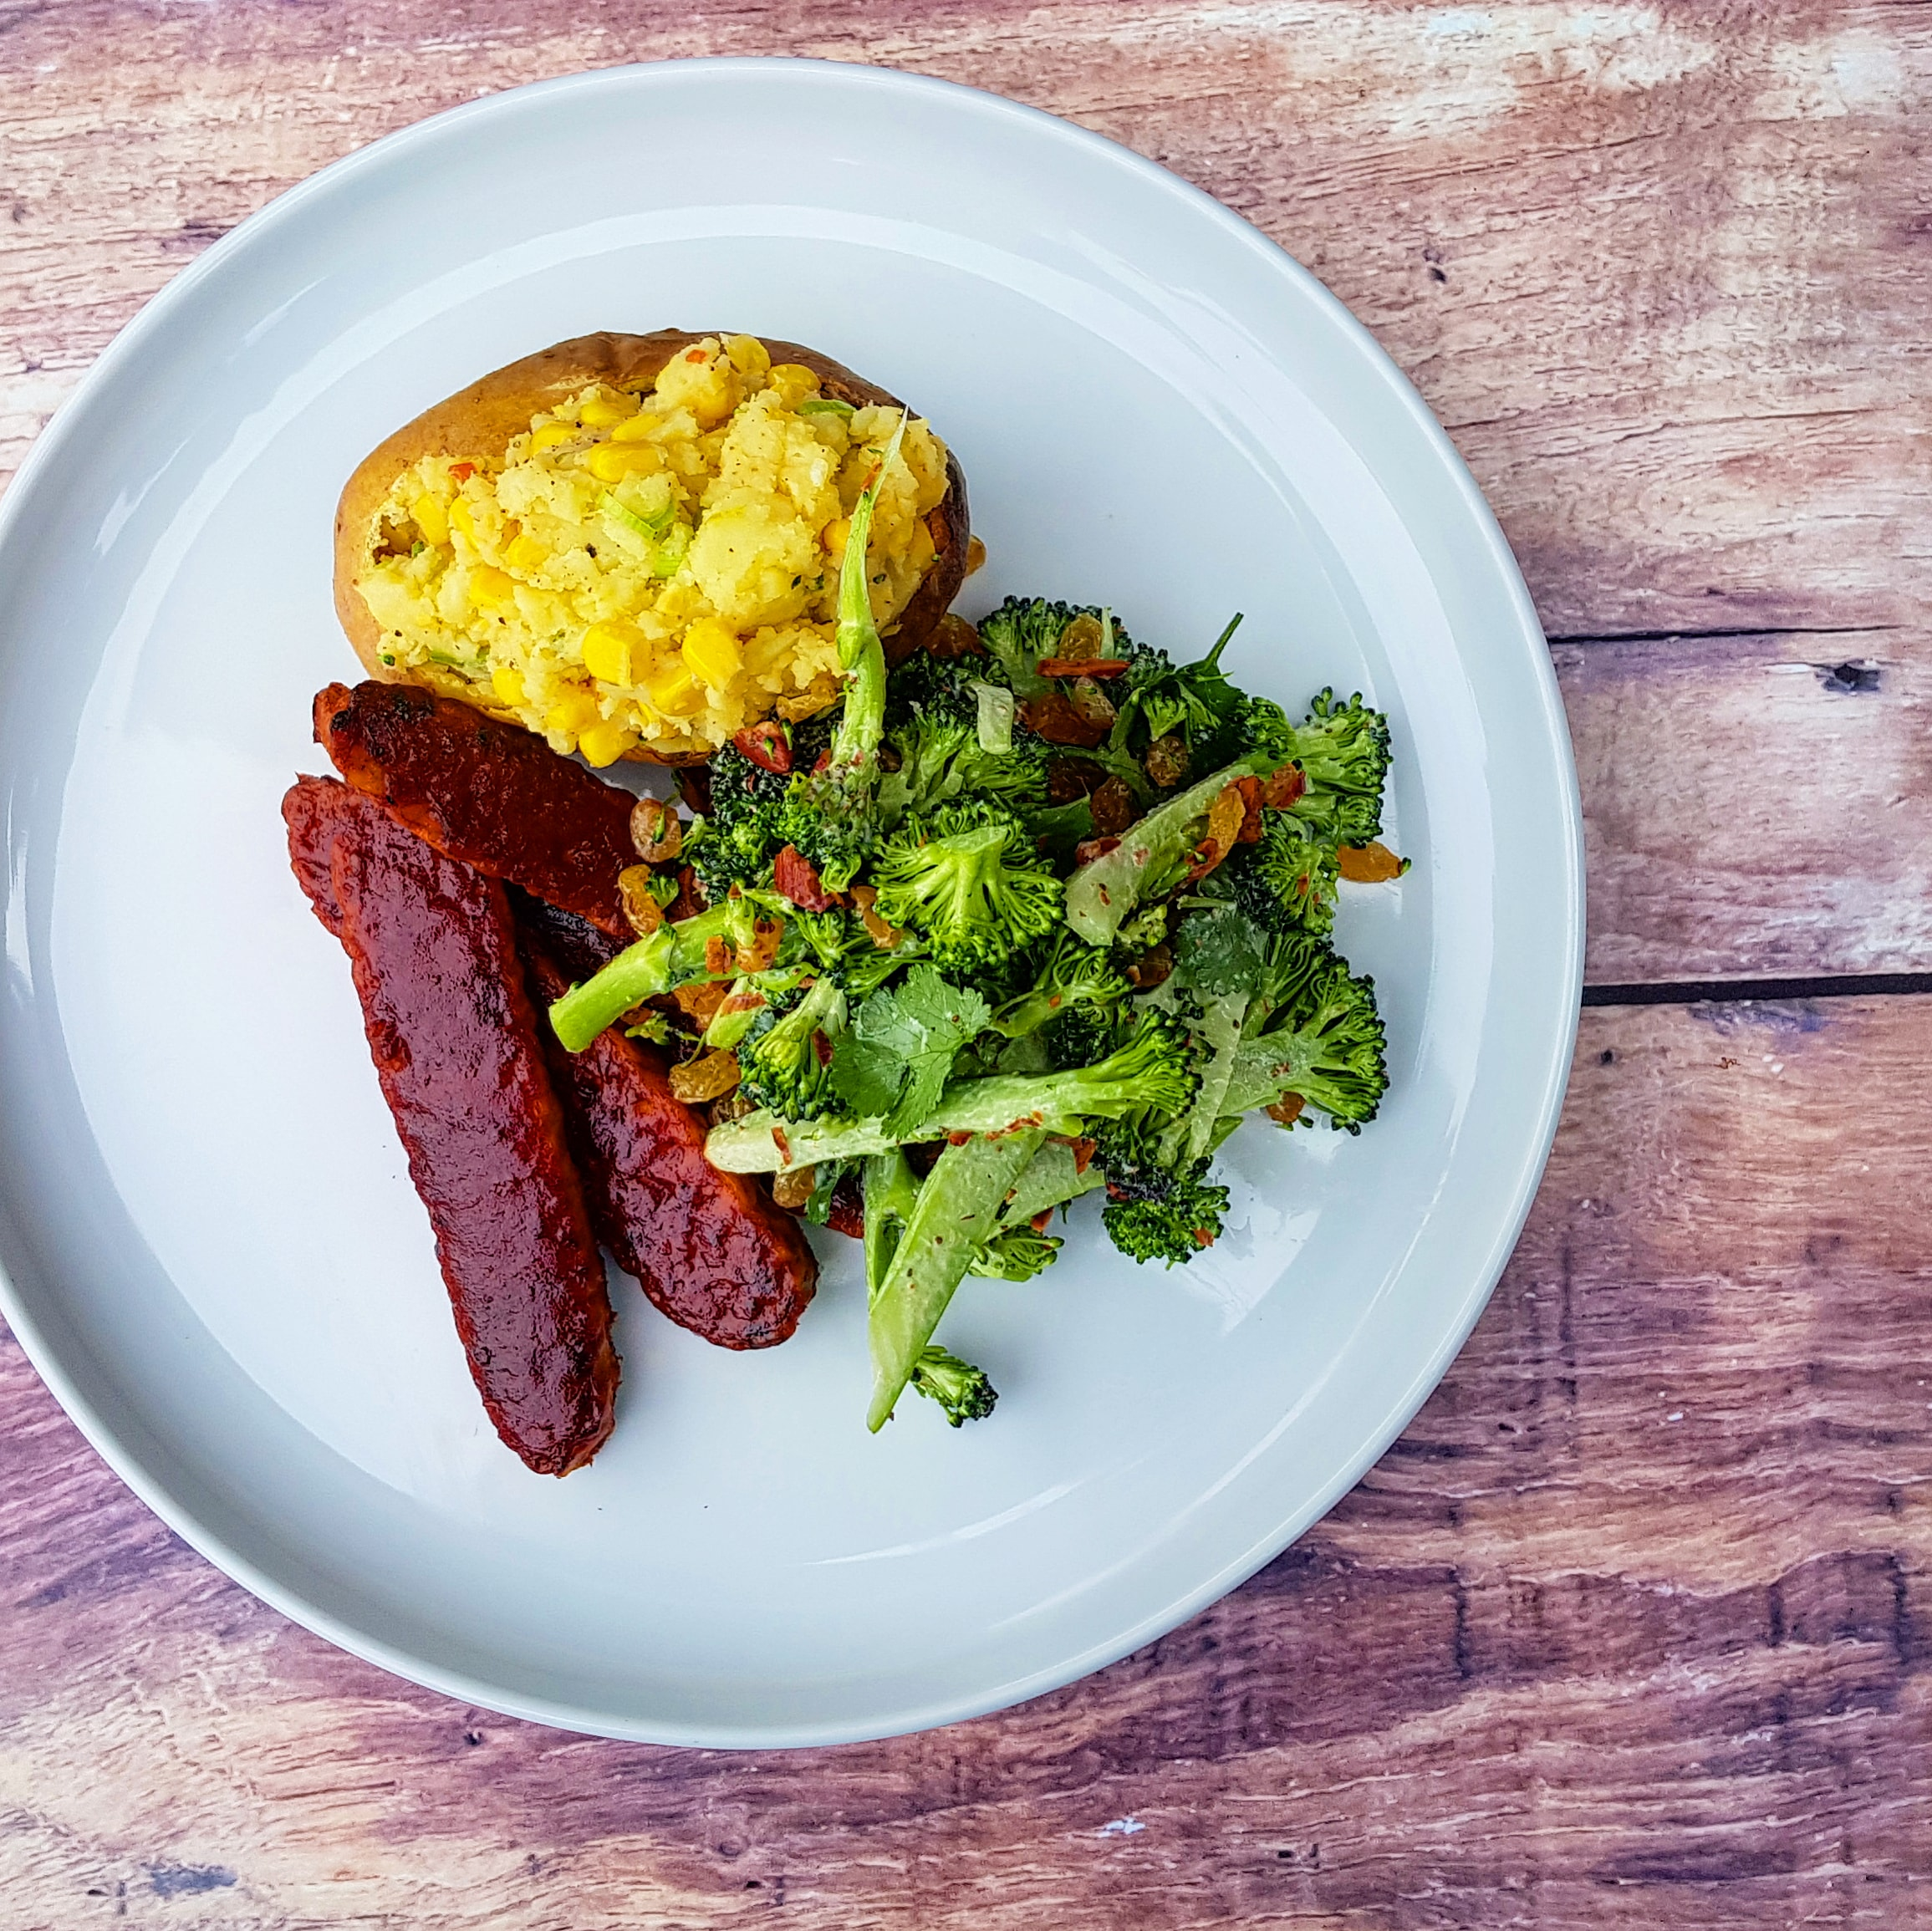 BBQ tempeh 'ribs', lemon thyme and corn stuffed potatoes, broccoli, almond and golden raisin ranch salad